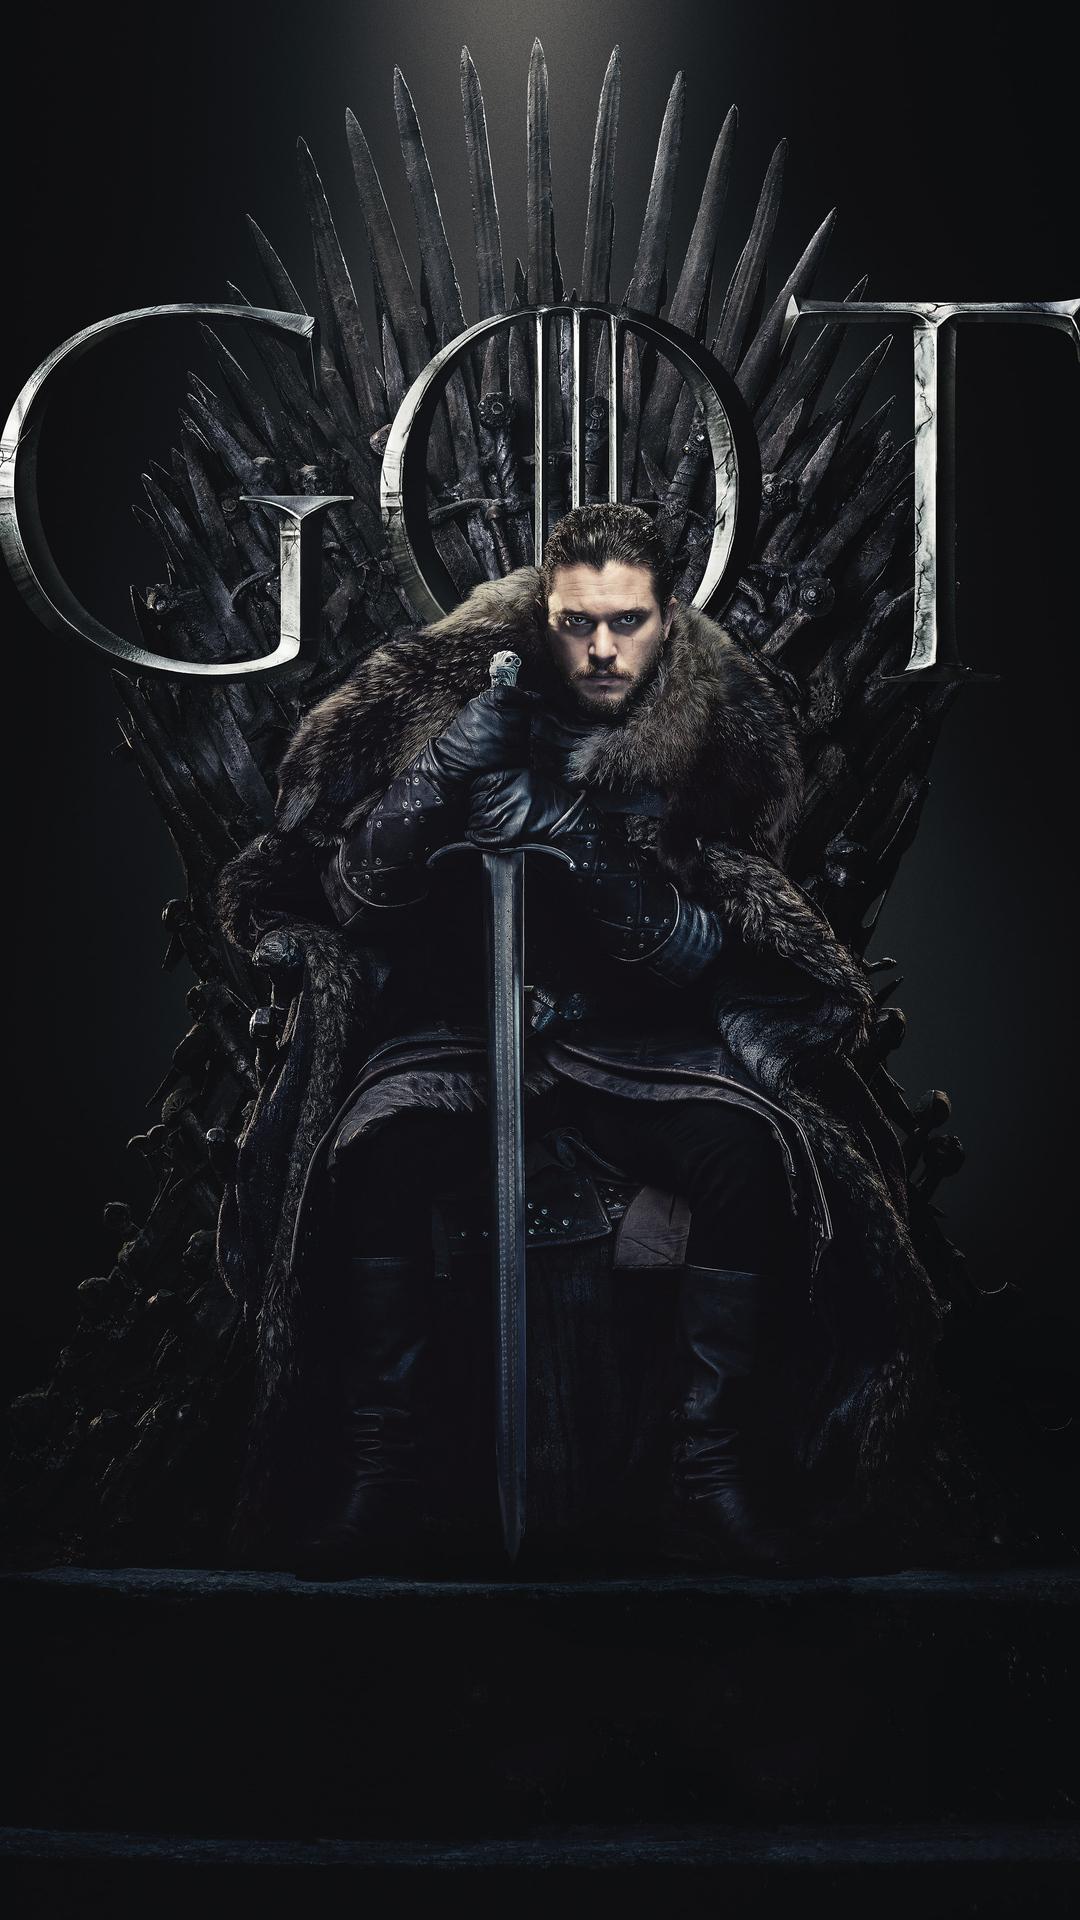 1080x1920 Jon Snow Game Of Thrones Season 8 Poster Iphone 76s6